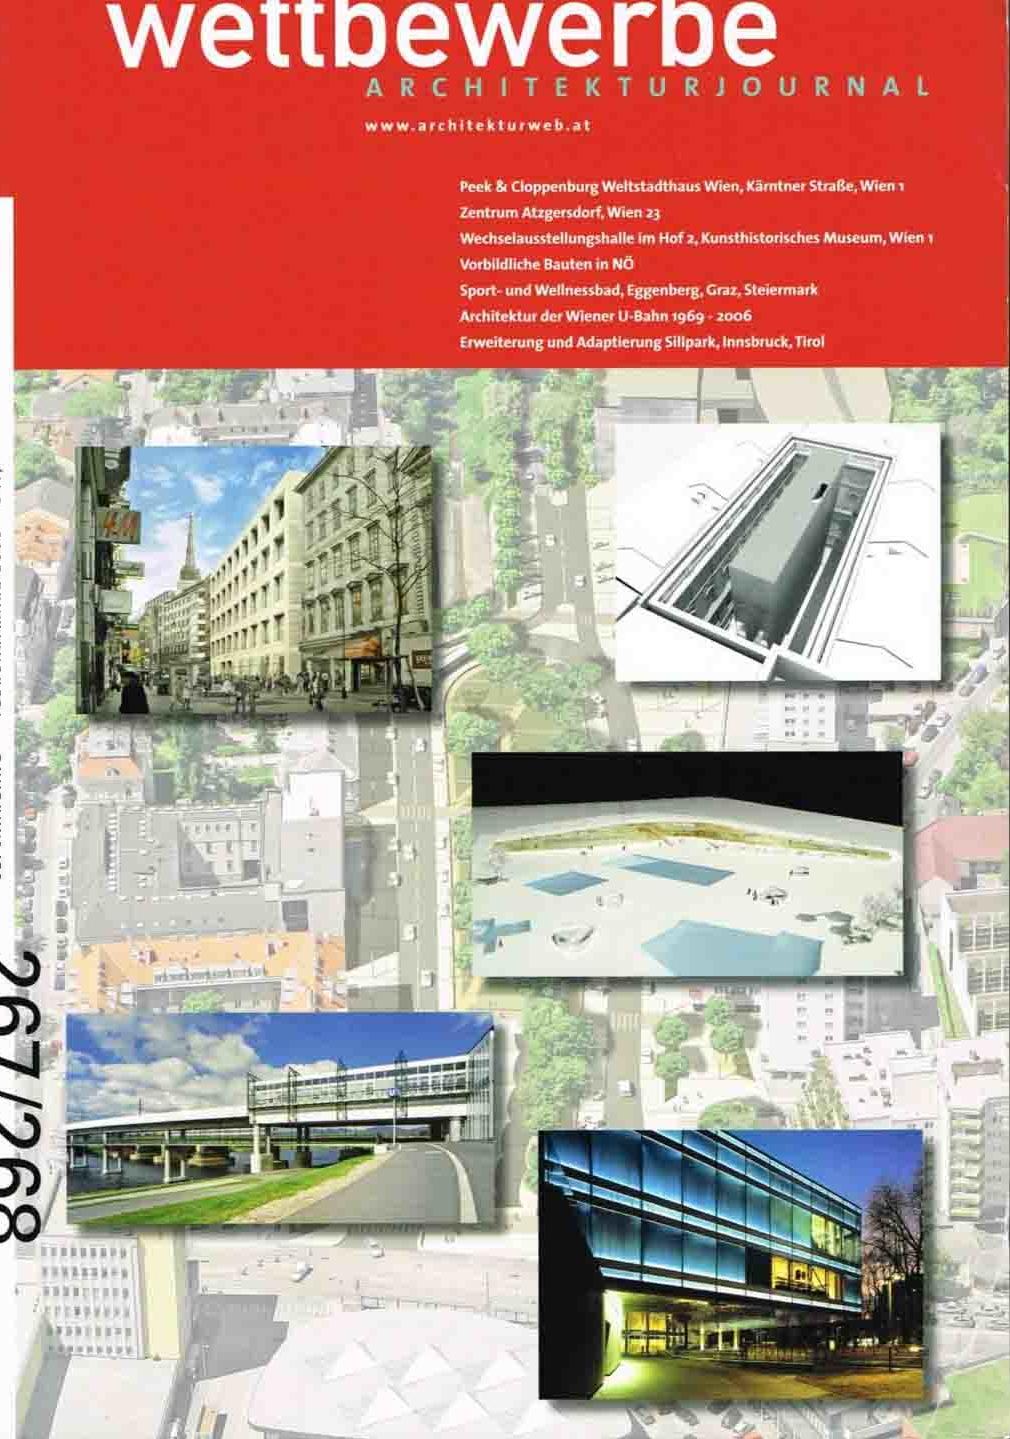 WETTEBEWERBE - Architecte